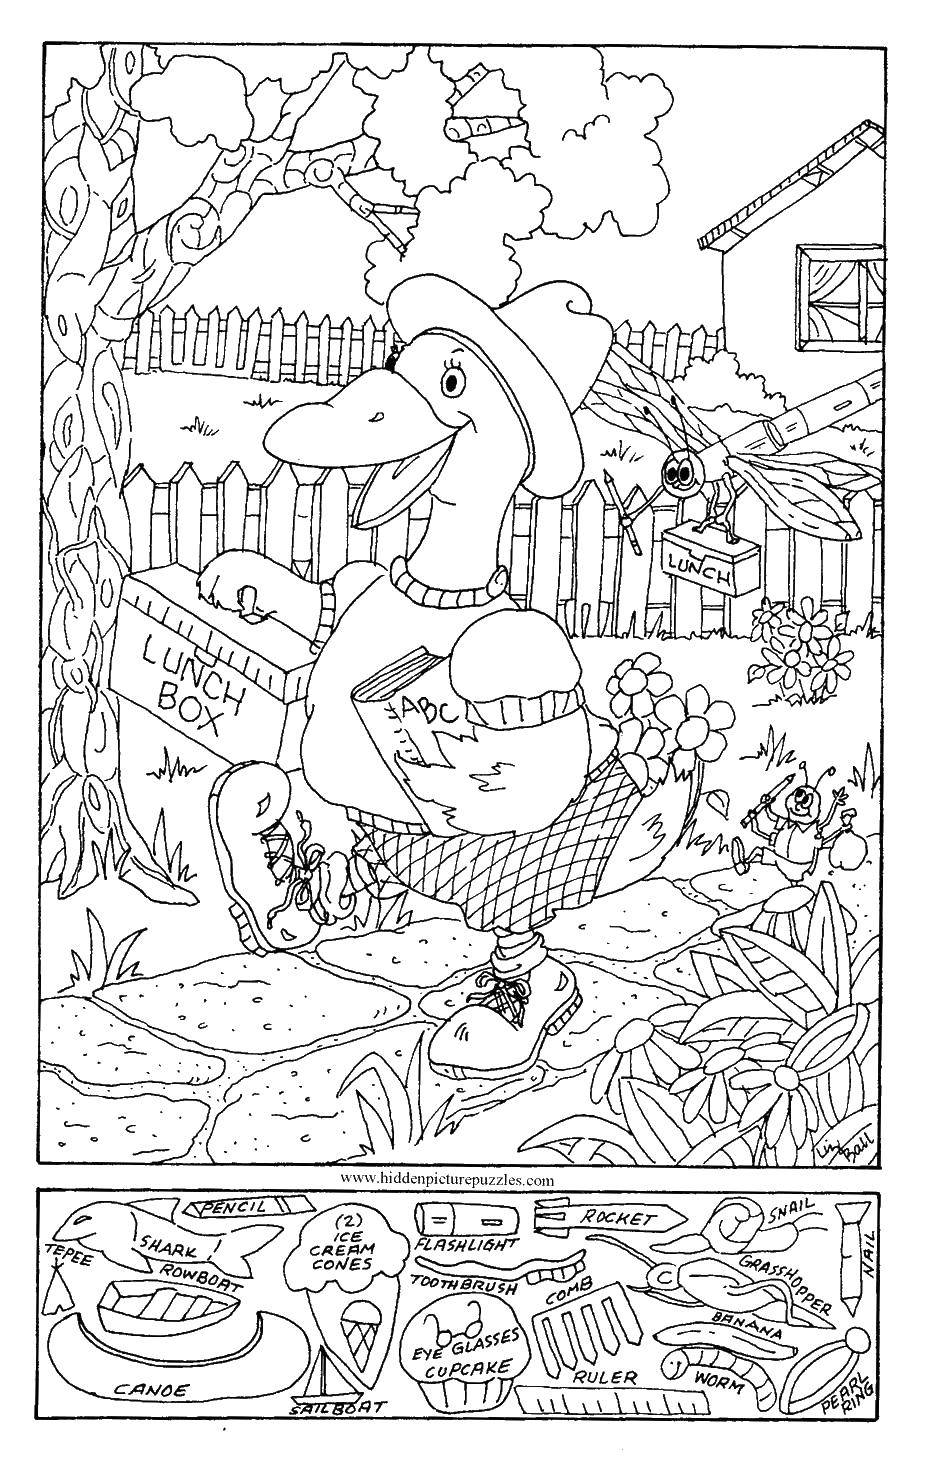 Название: Раскраска Утка идет в школу. Категория: Найди что спрятано. Теги: Утка, птица.